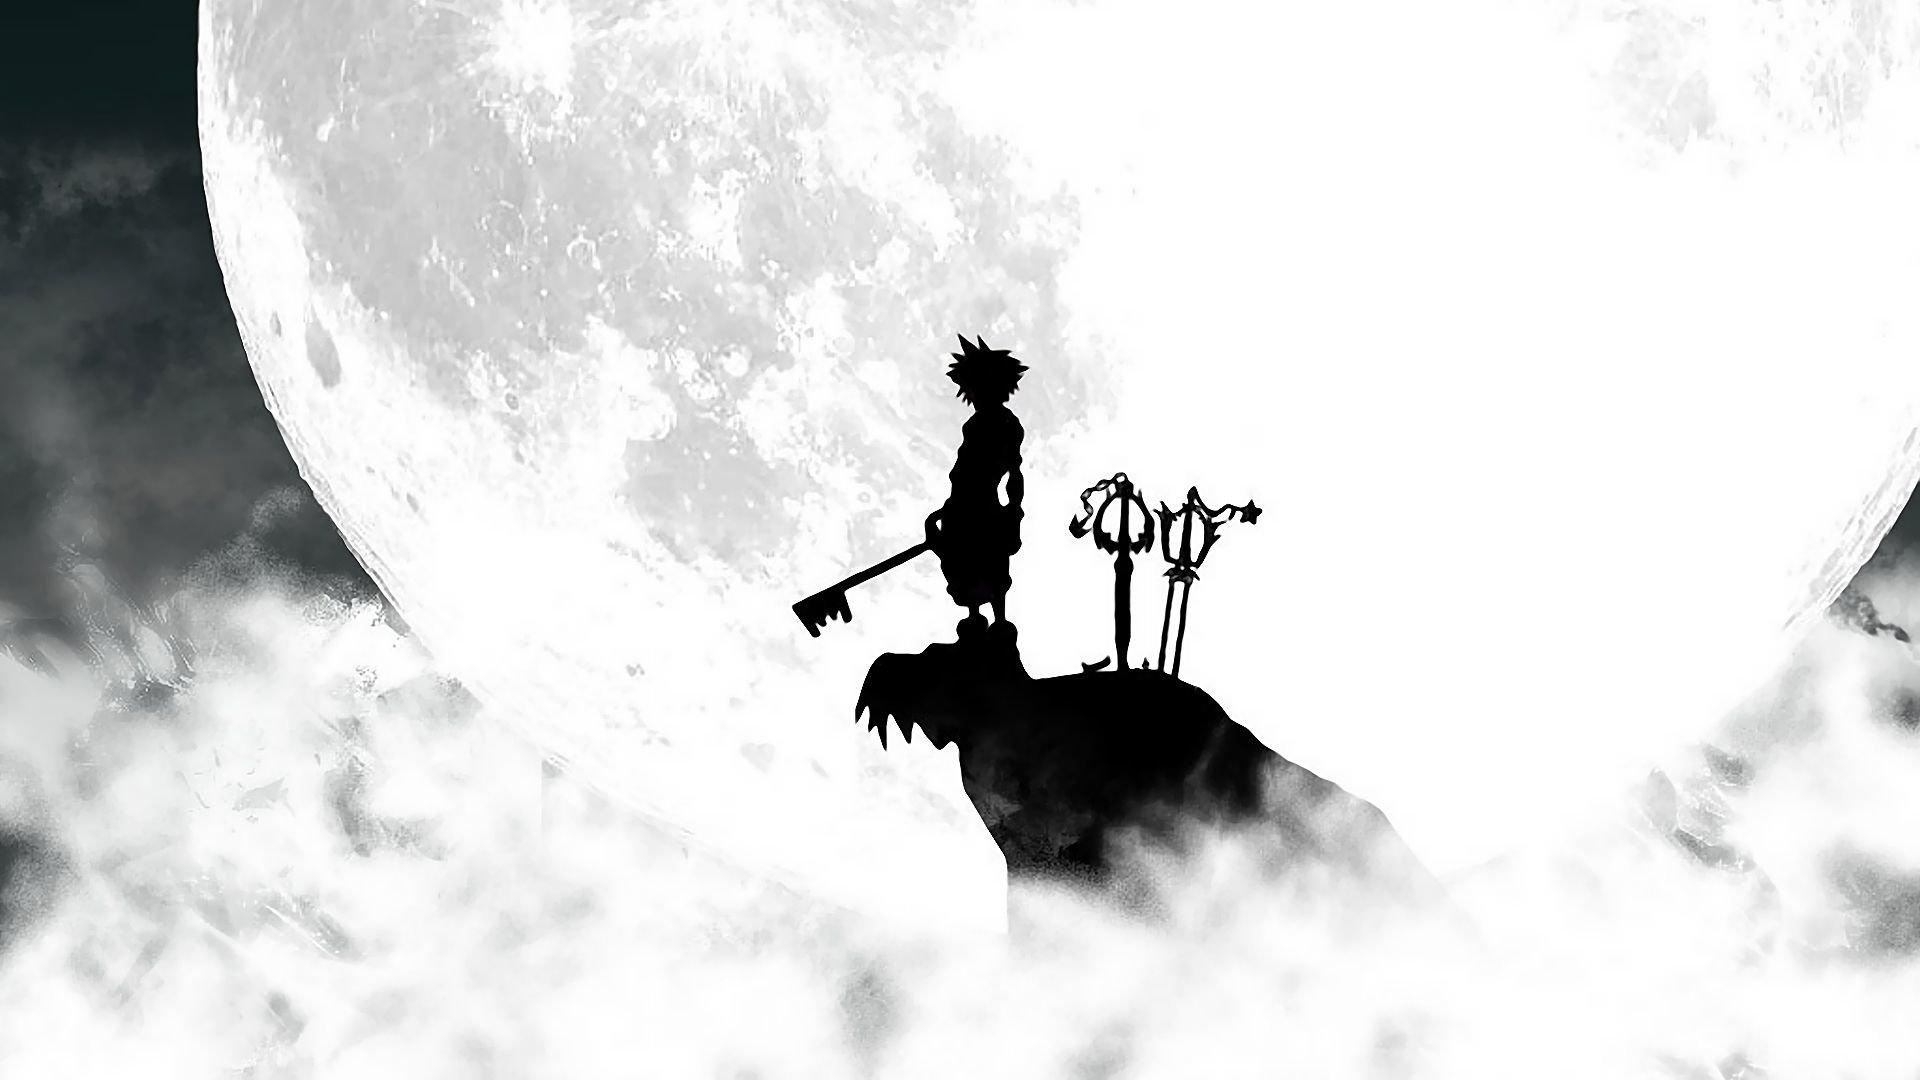 Kingdom Hearts Sora Silhouette HD Wallpaper | Background ...